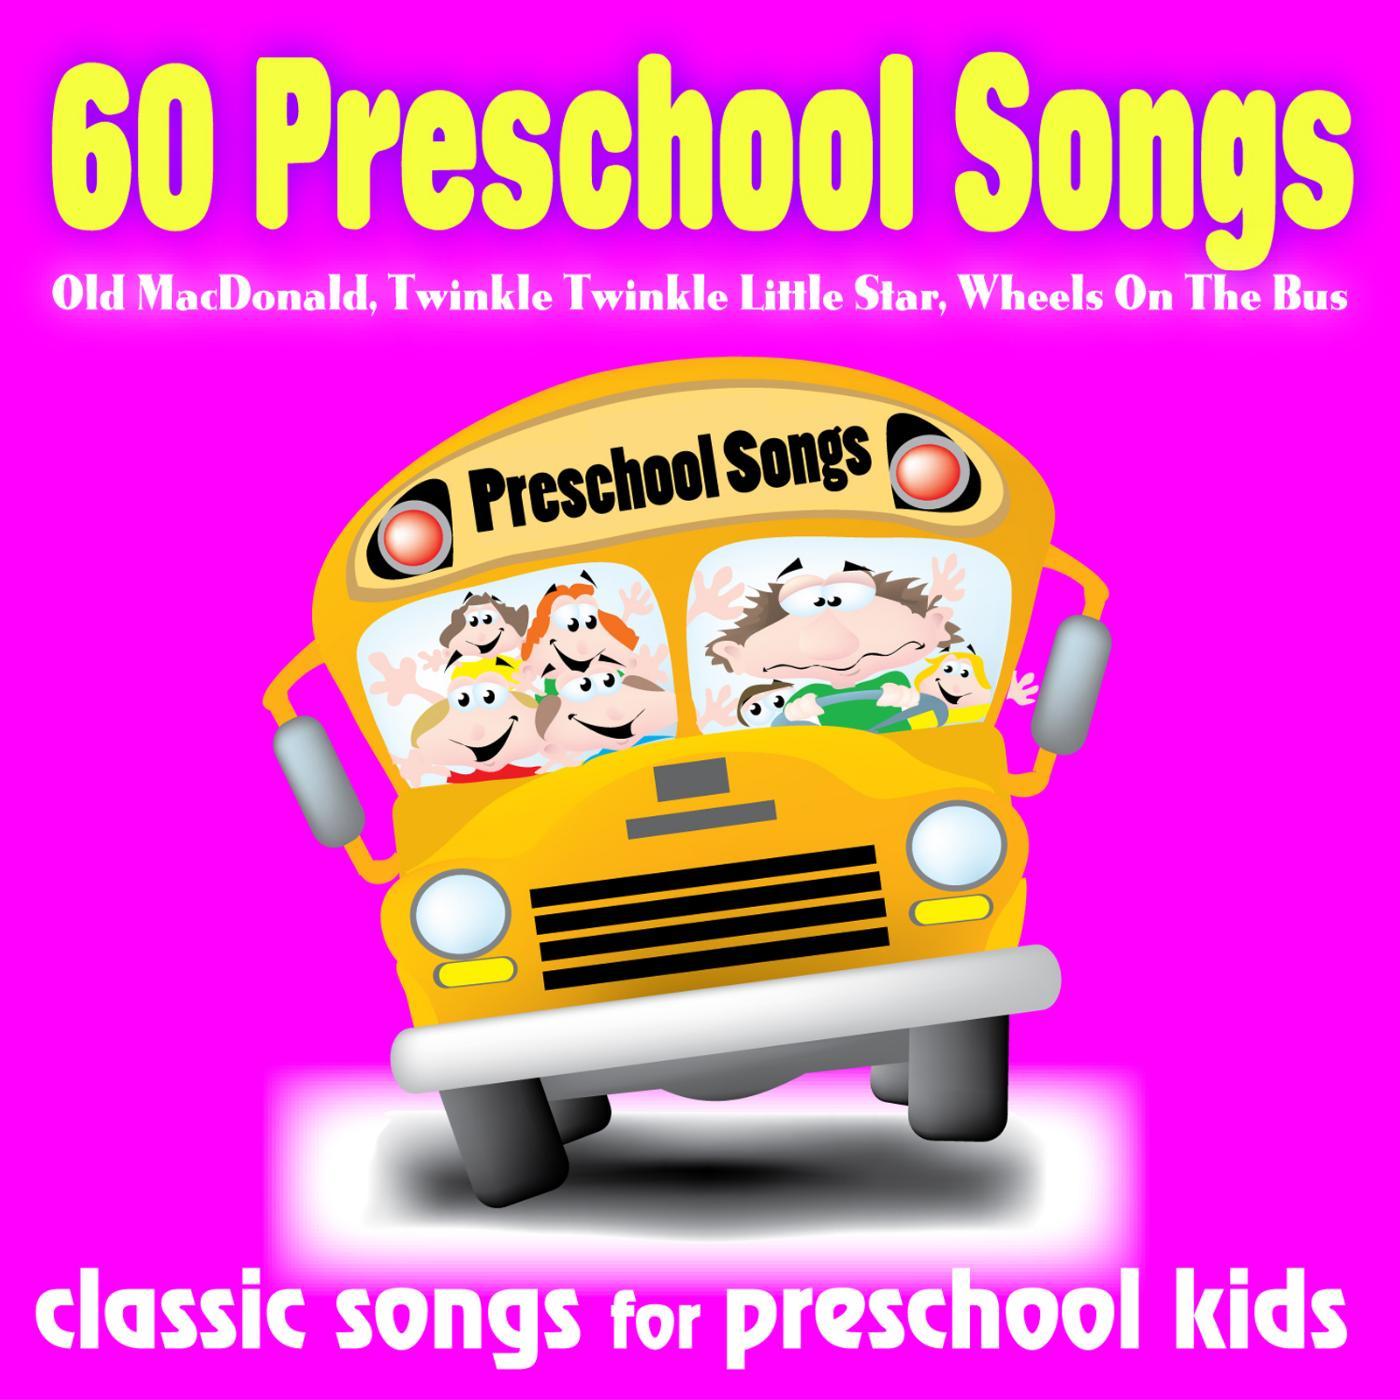 Listen Free To Classic Songs For Preschool Kids